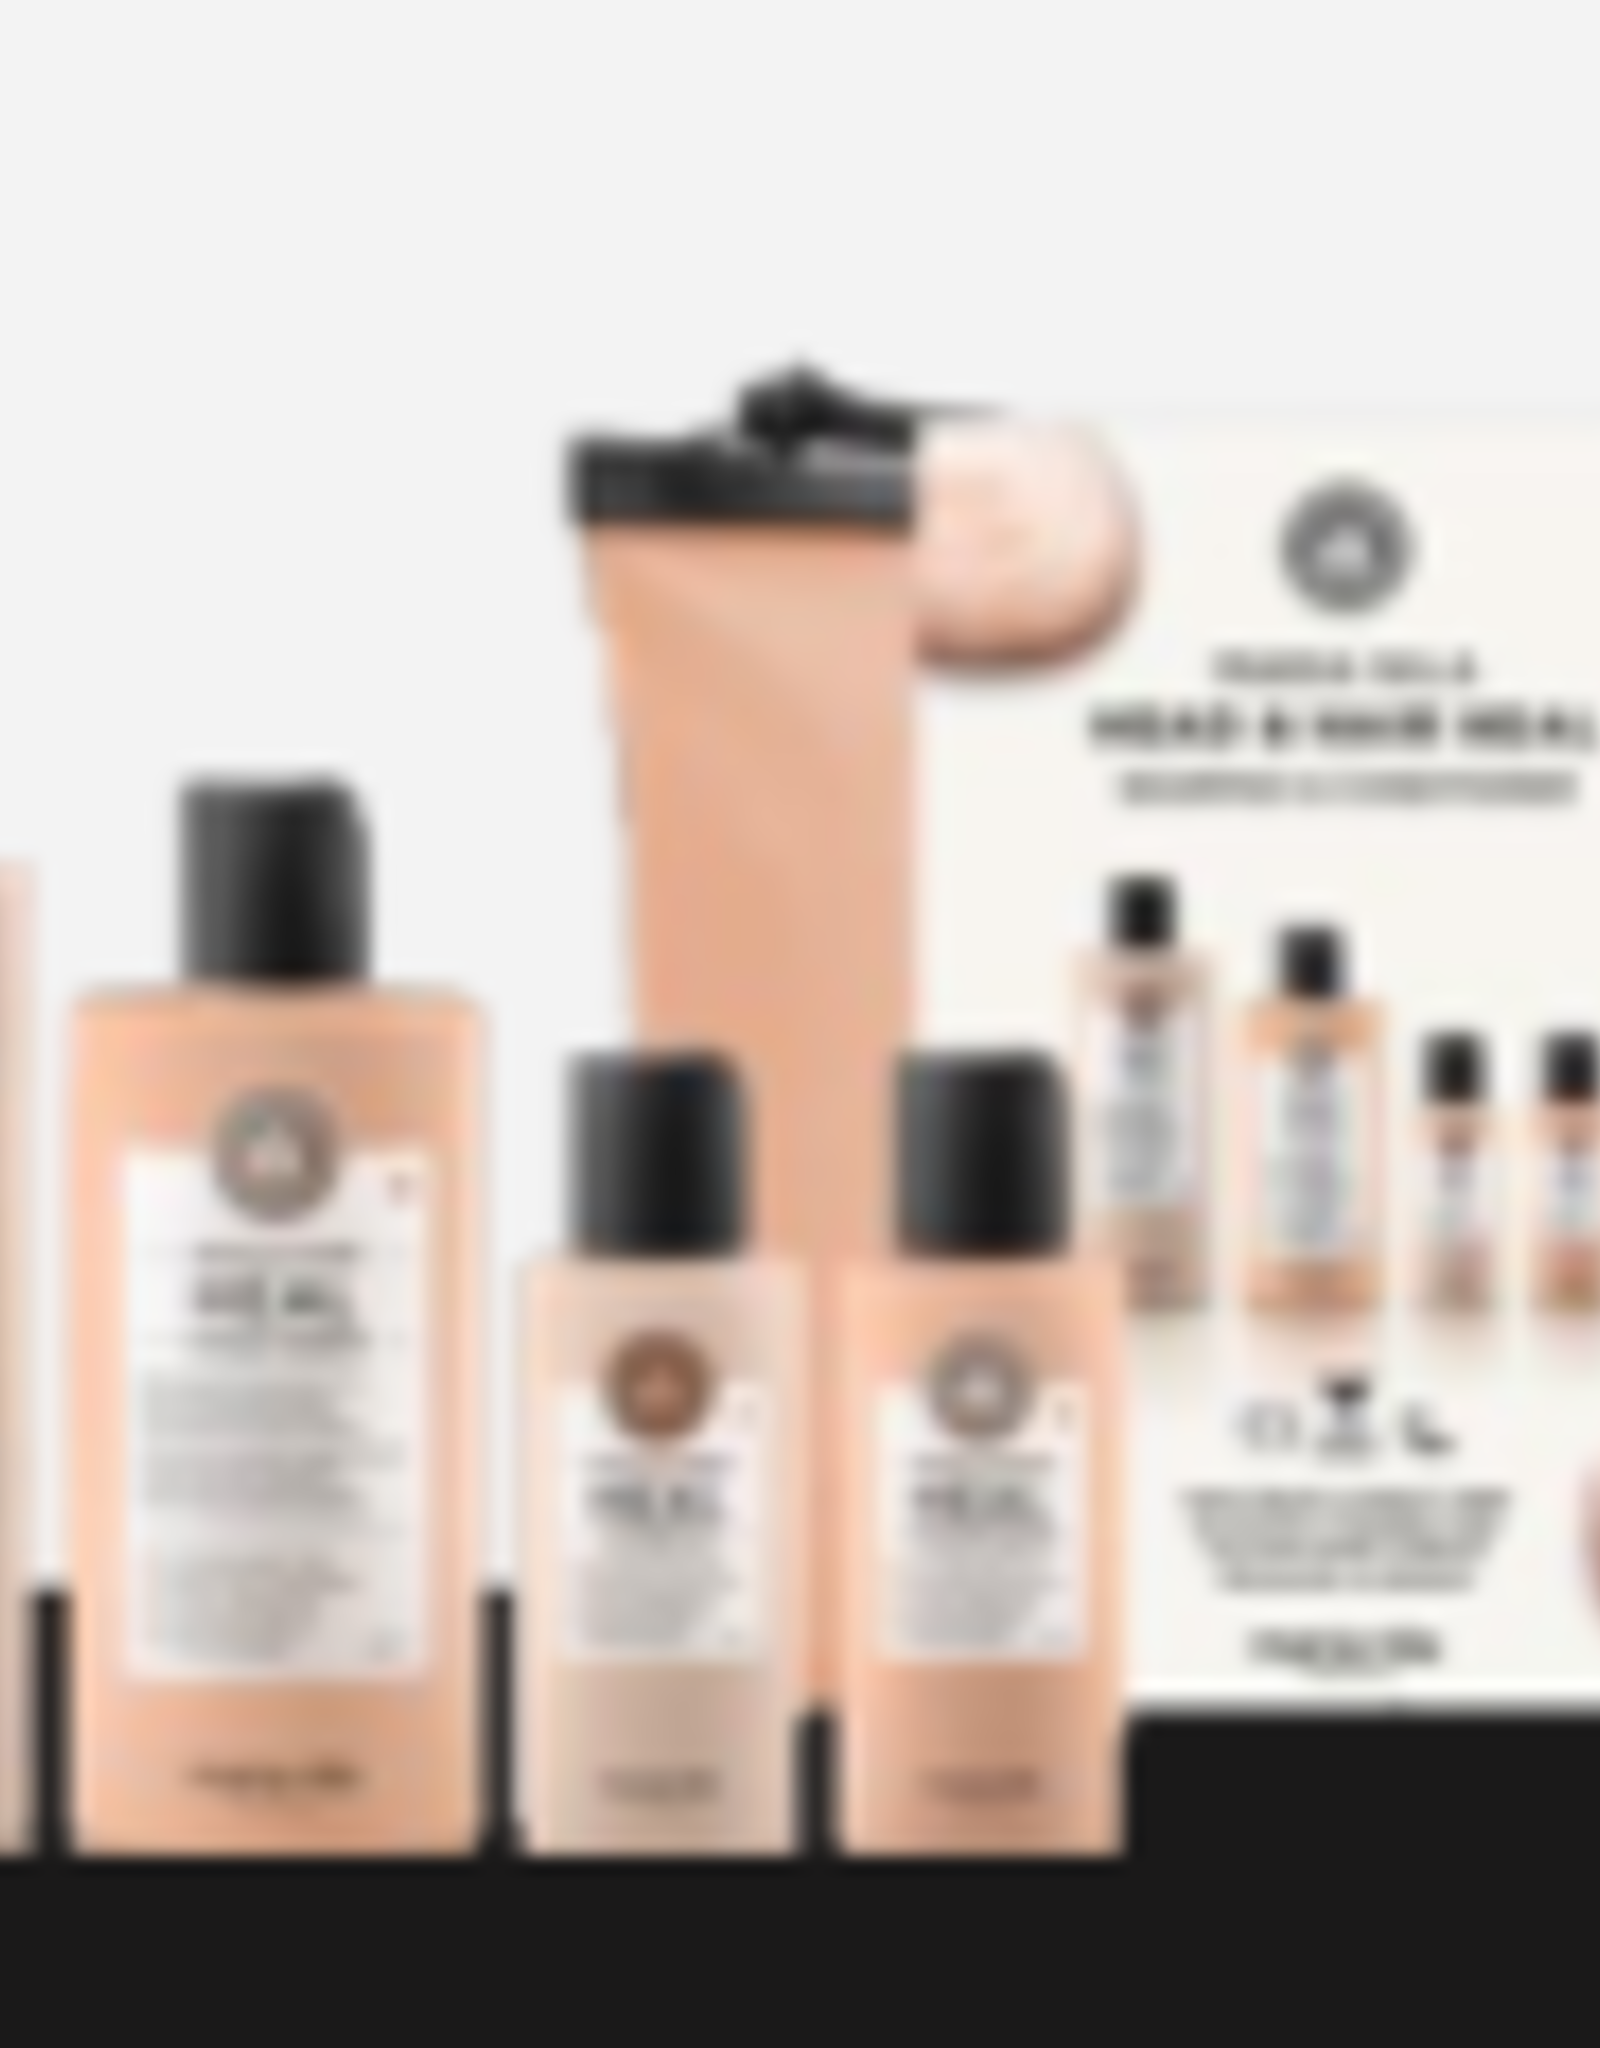 Maria Nila Beauty Bag Head & Hair Heal - Shampoo 350ml & Conditioner 300ml + travel size 2 x 100ml